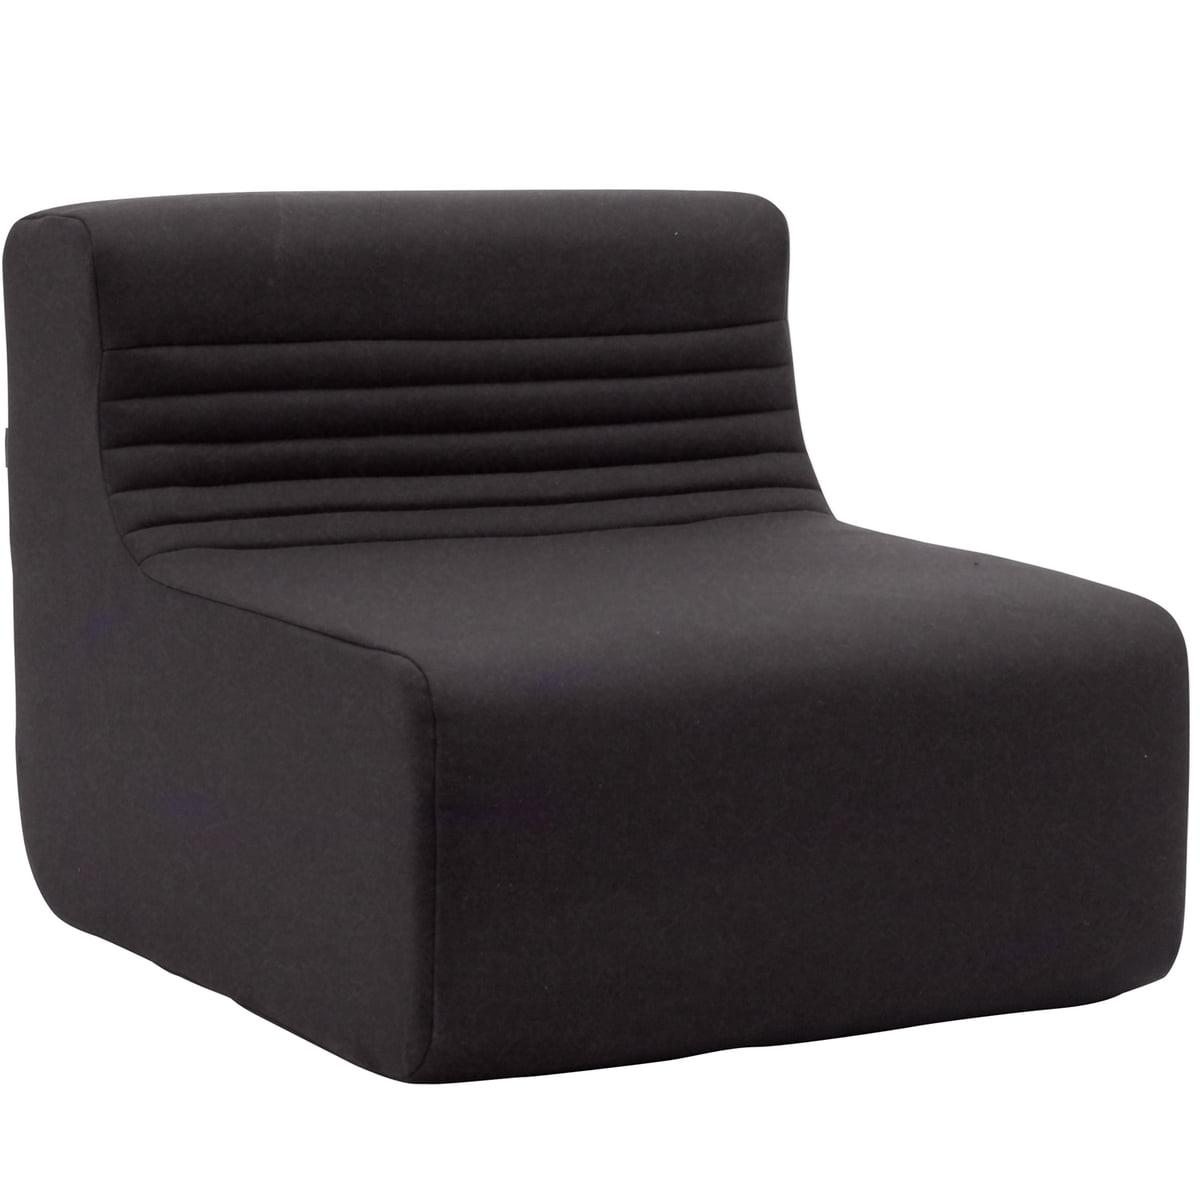 Beau Softline   Loft Indoor Modular Sofa, Single Unit, Felt Dark Grey